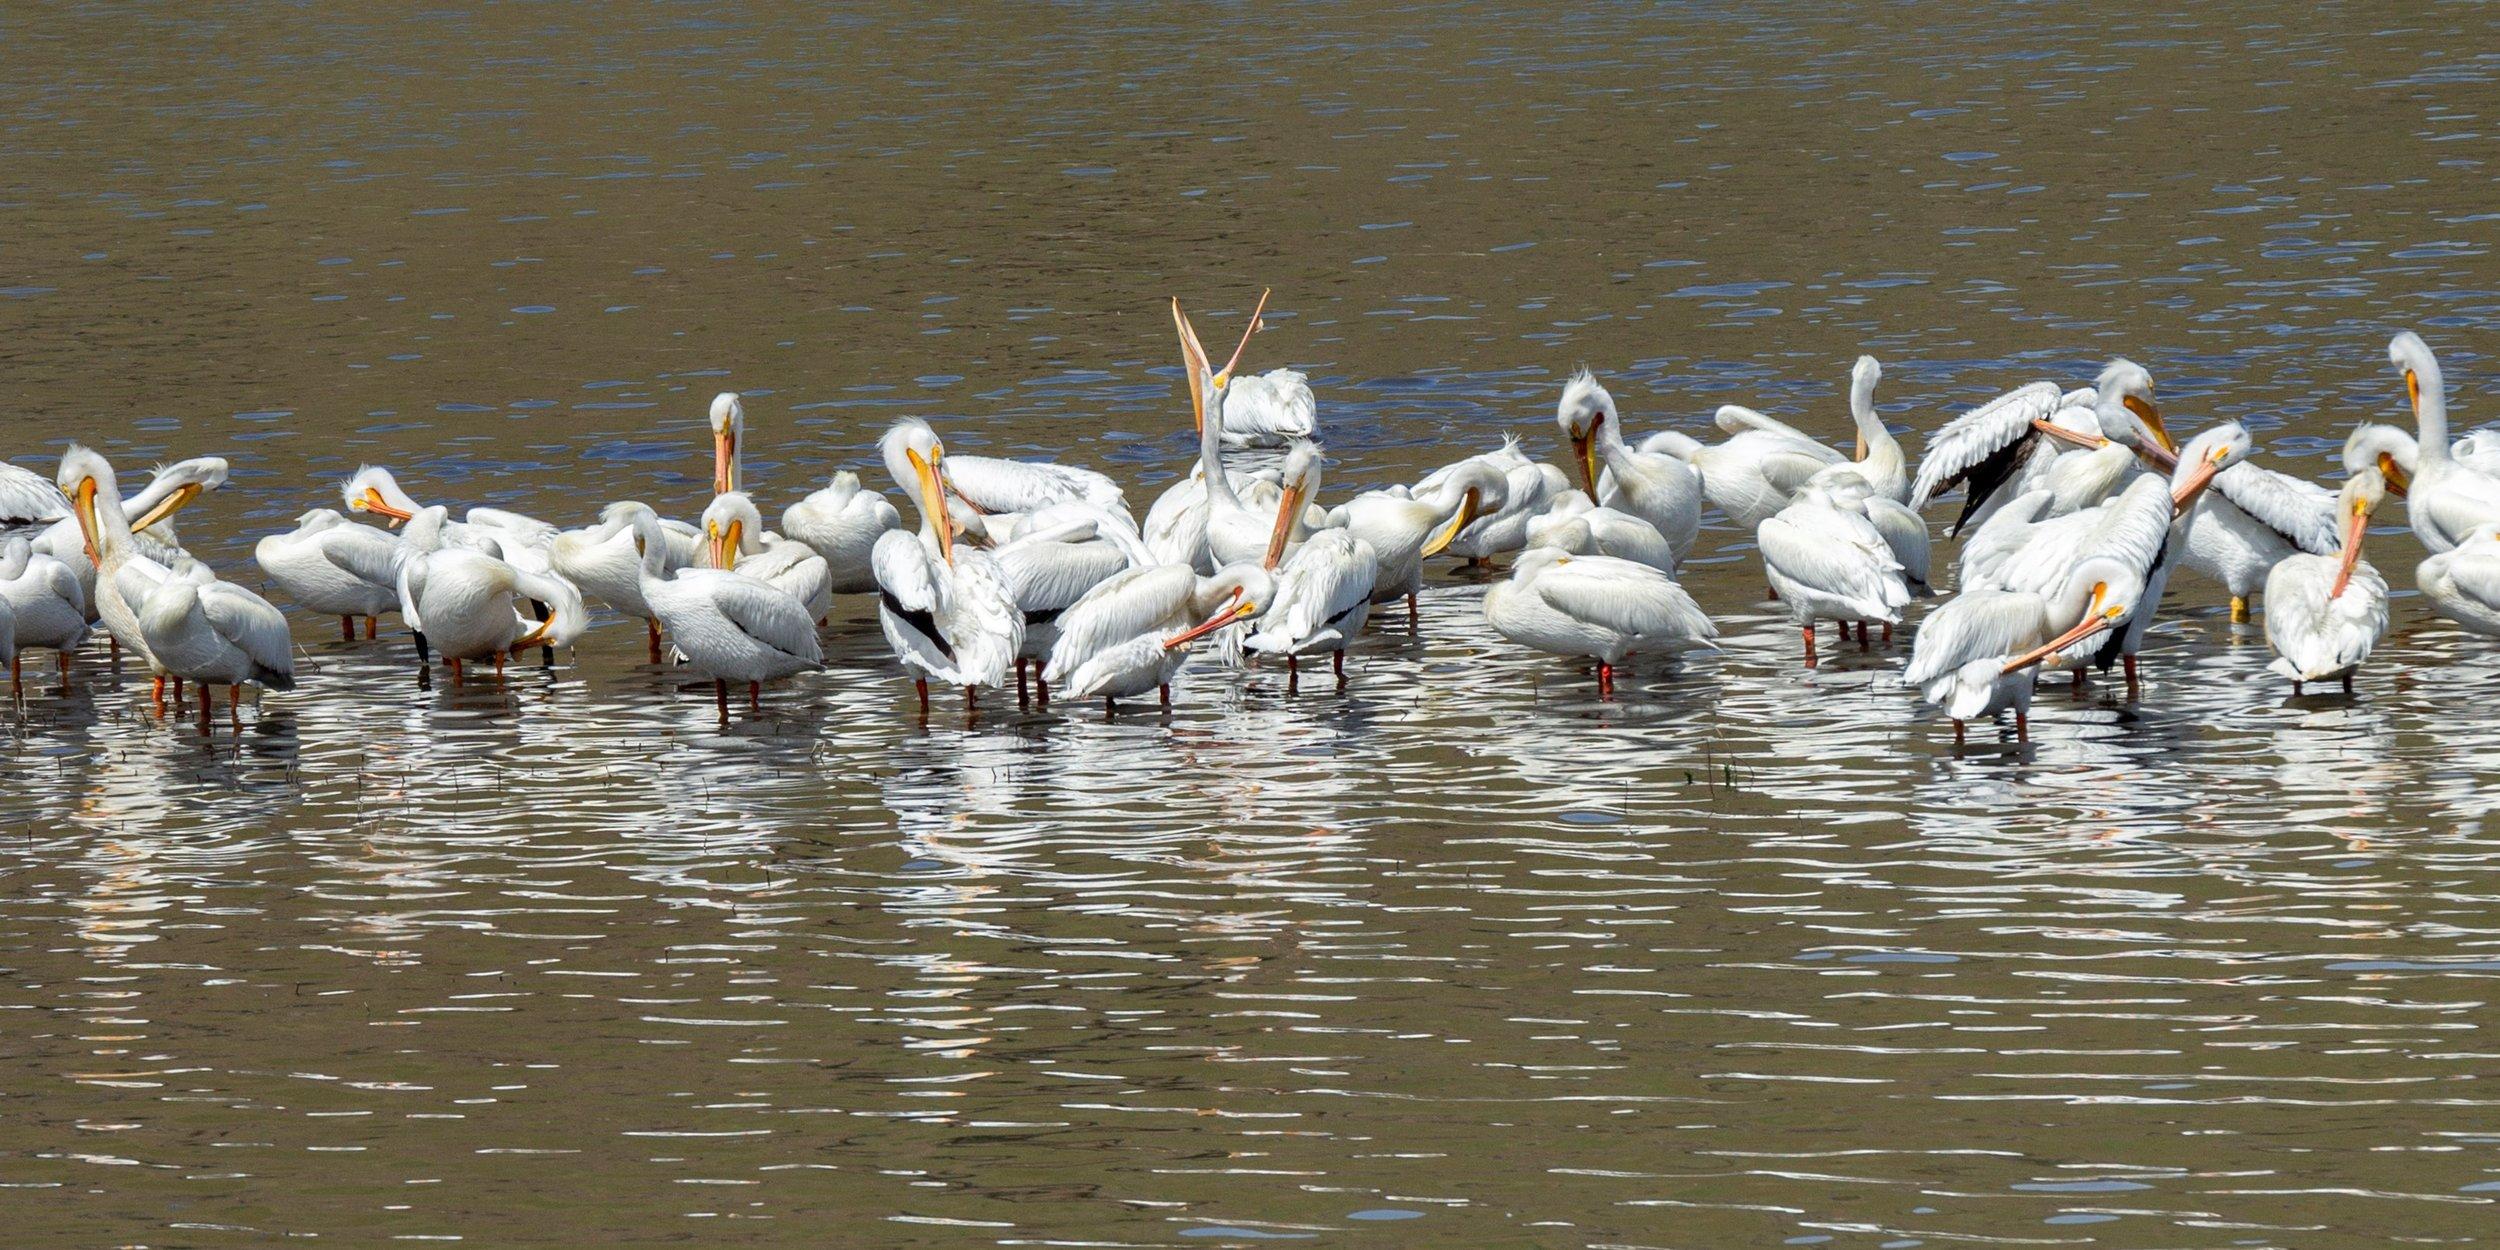 Pelicans in the Clearwater  by Debi Carpadus